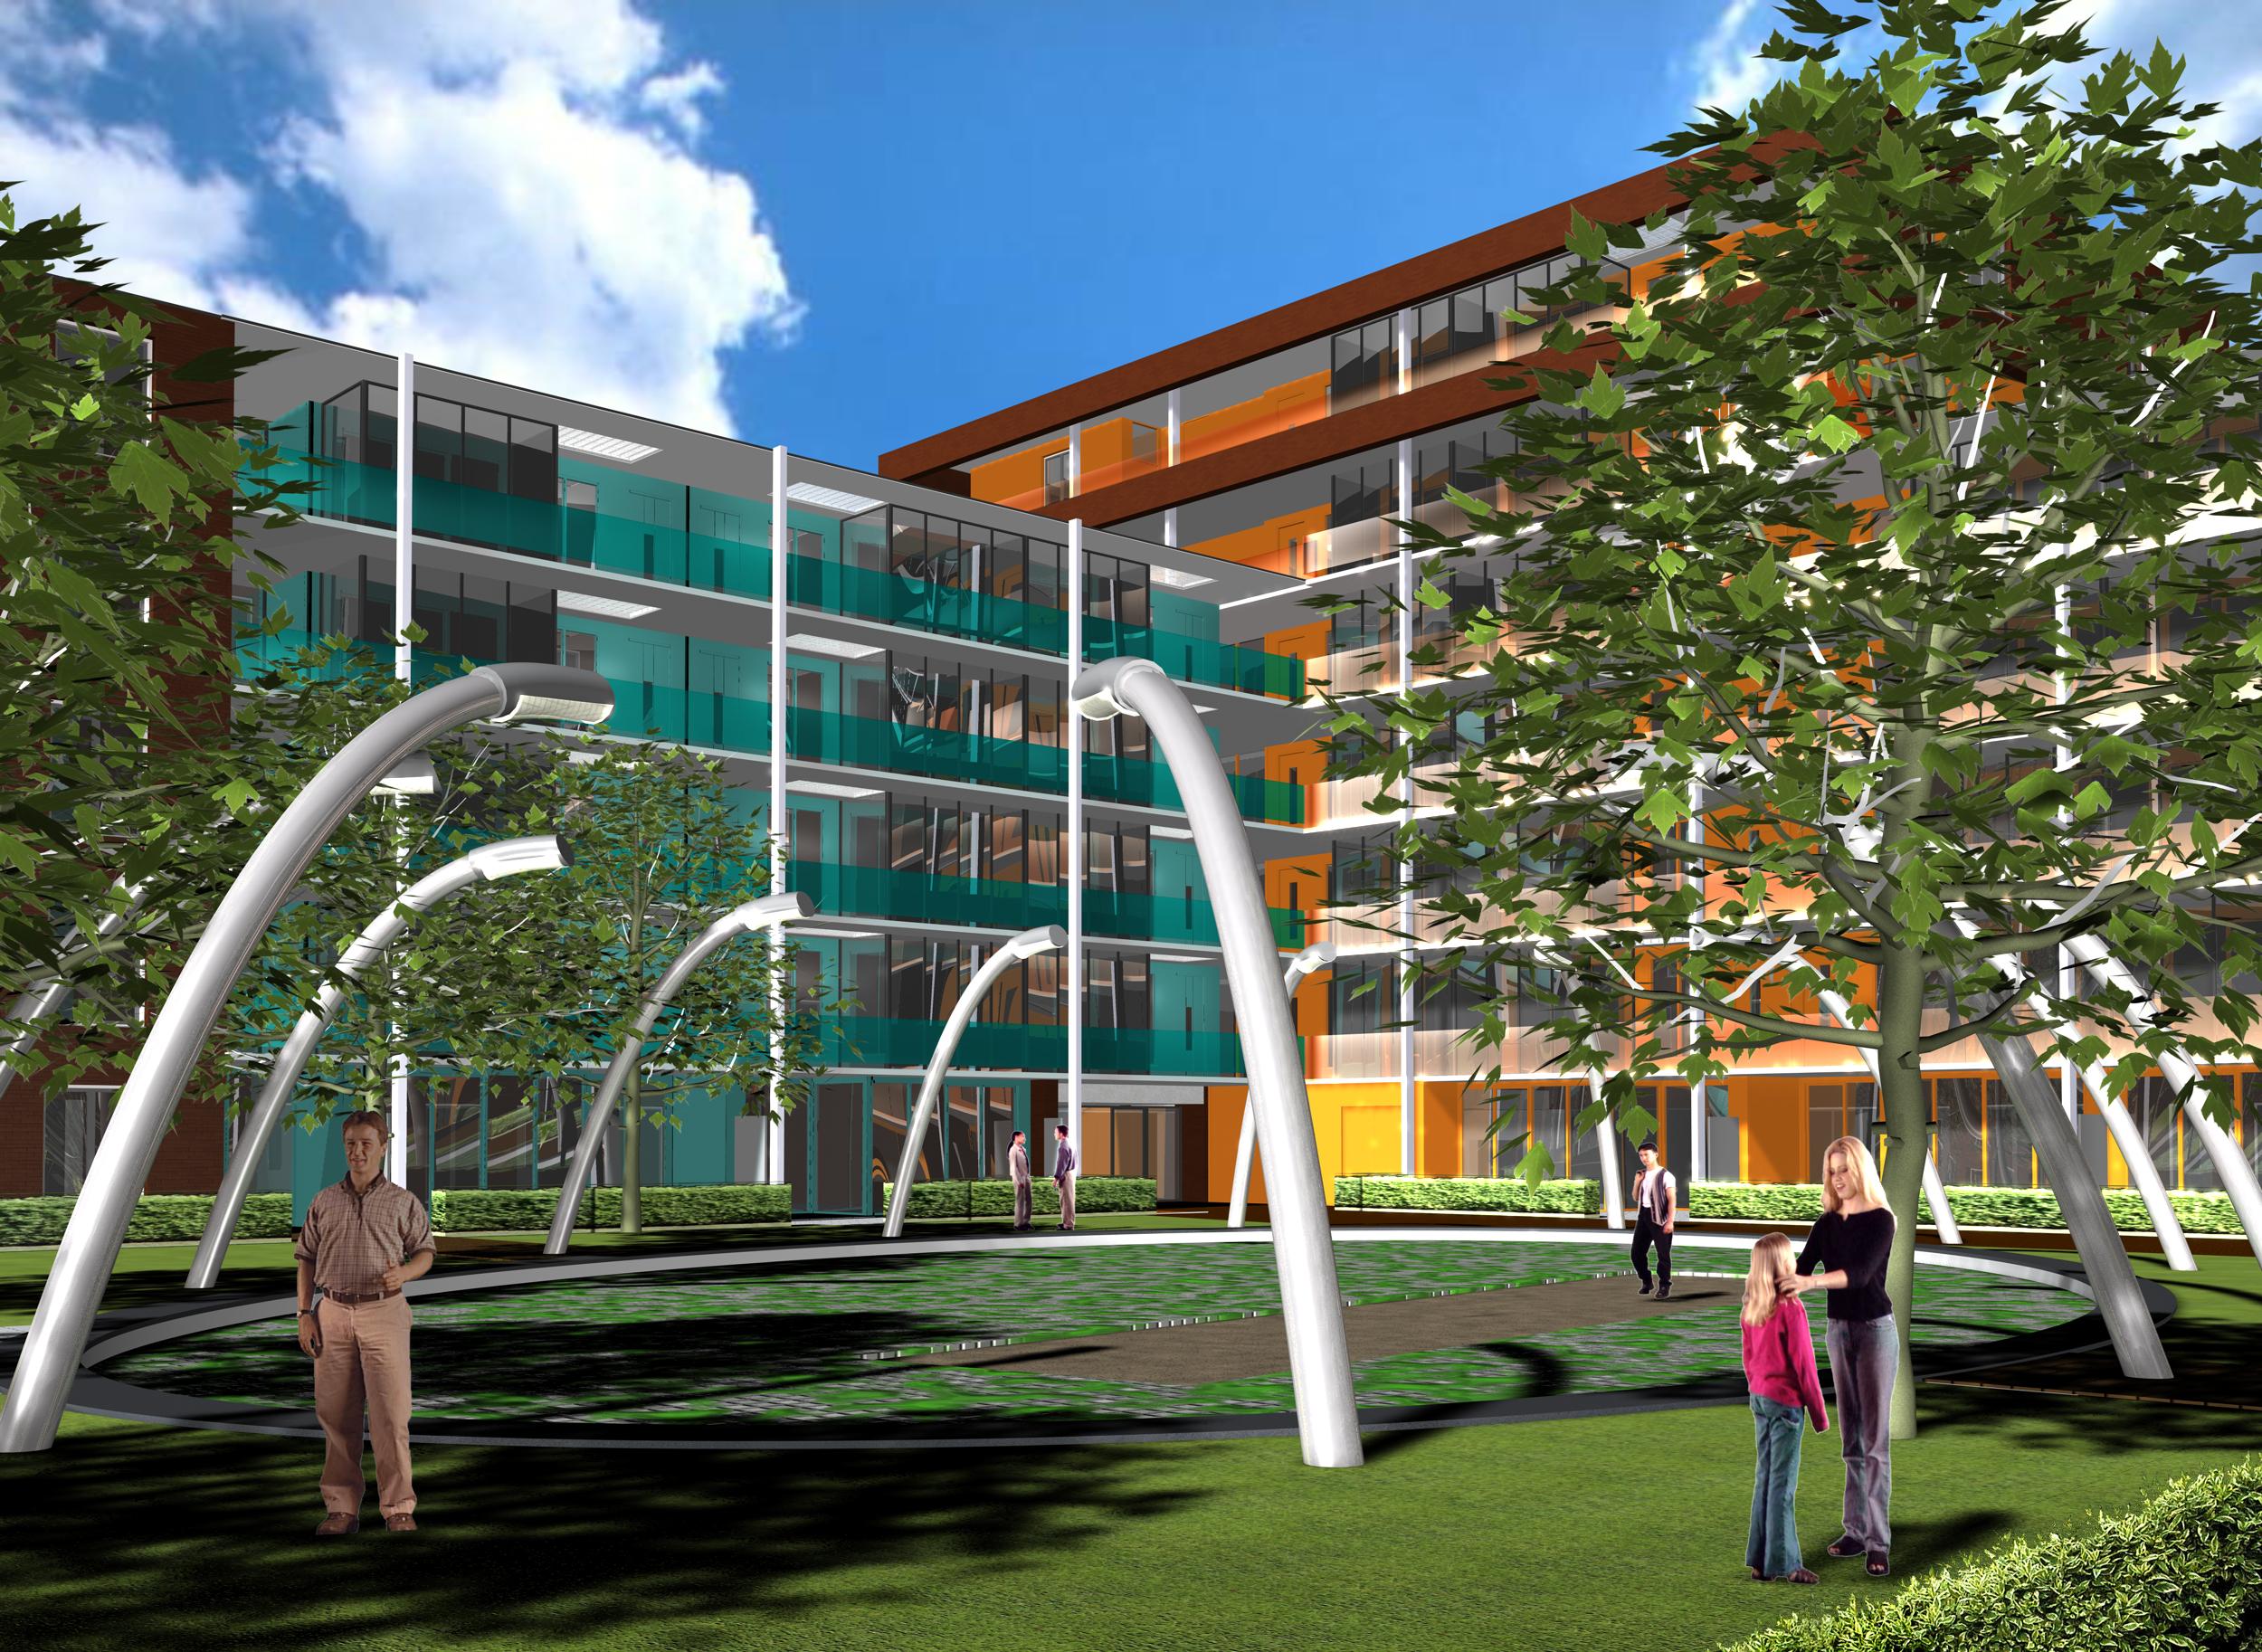 wilbertblom.com-ArchitectuurExterieur2